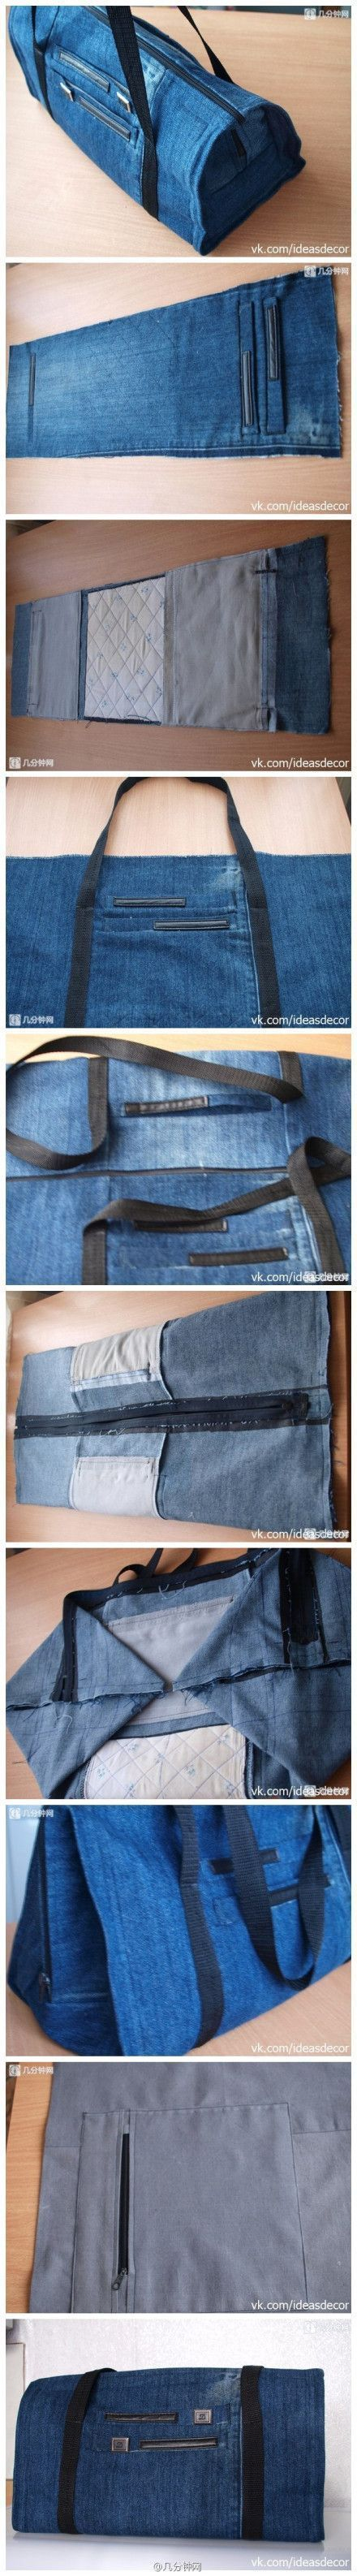 jeans bag … More: